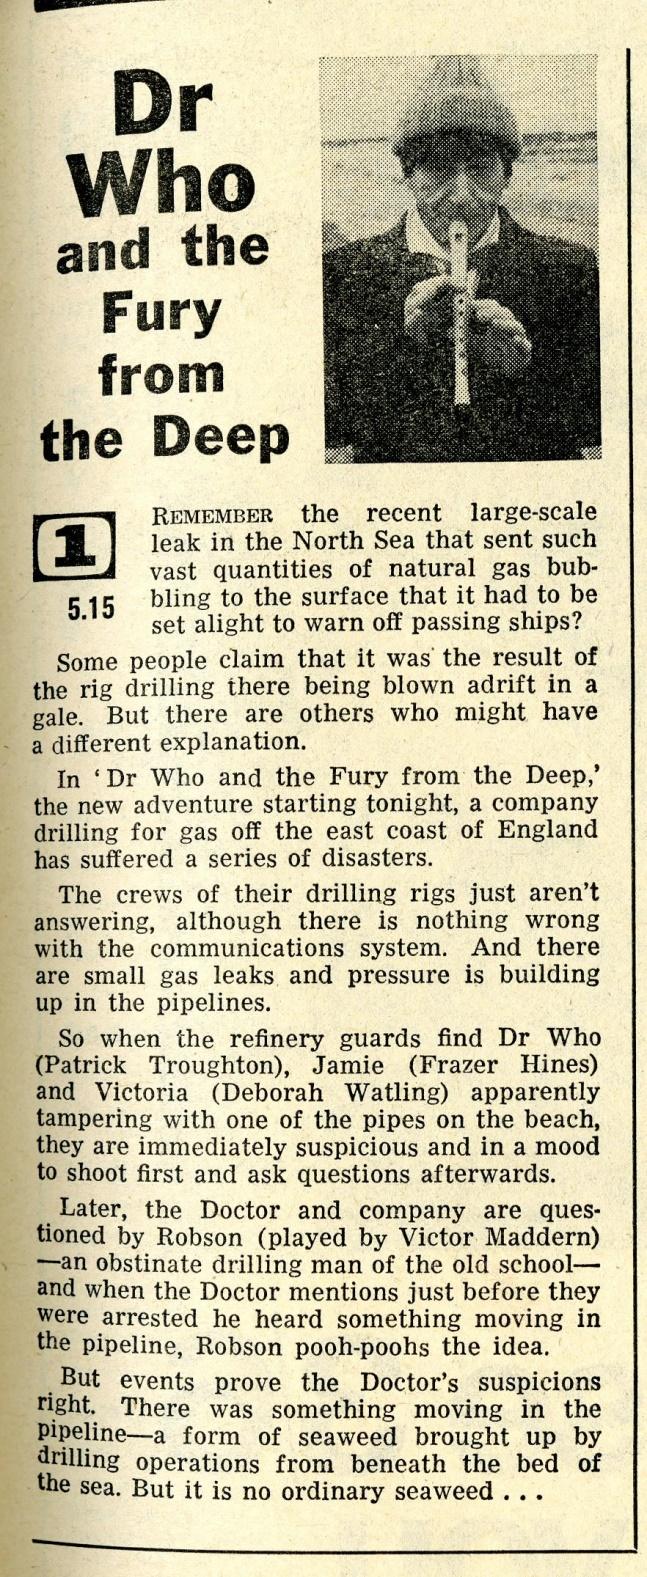 Radio Times, 16-22 March 1968